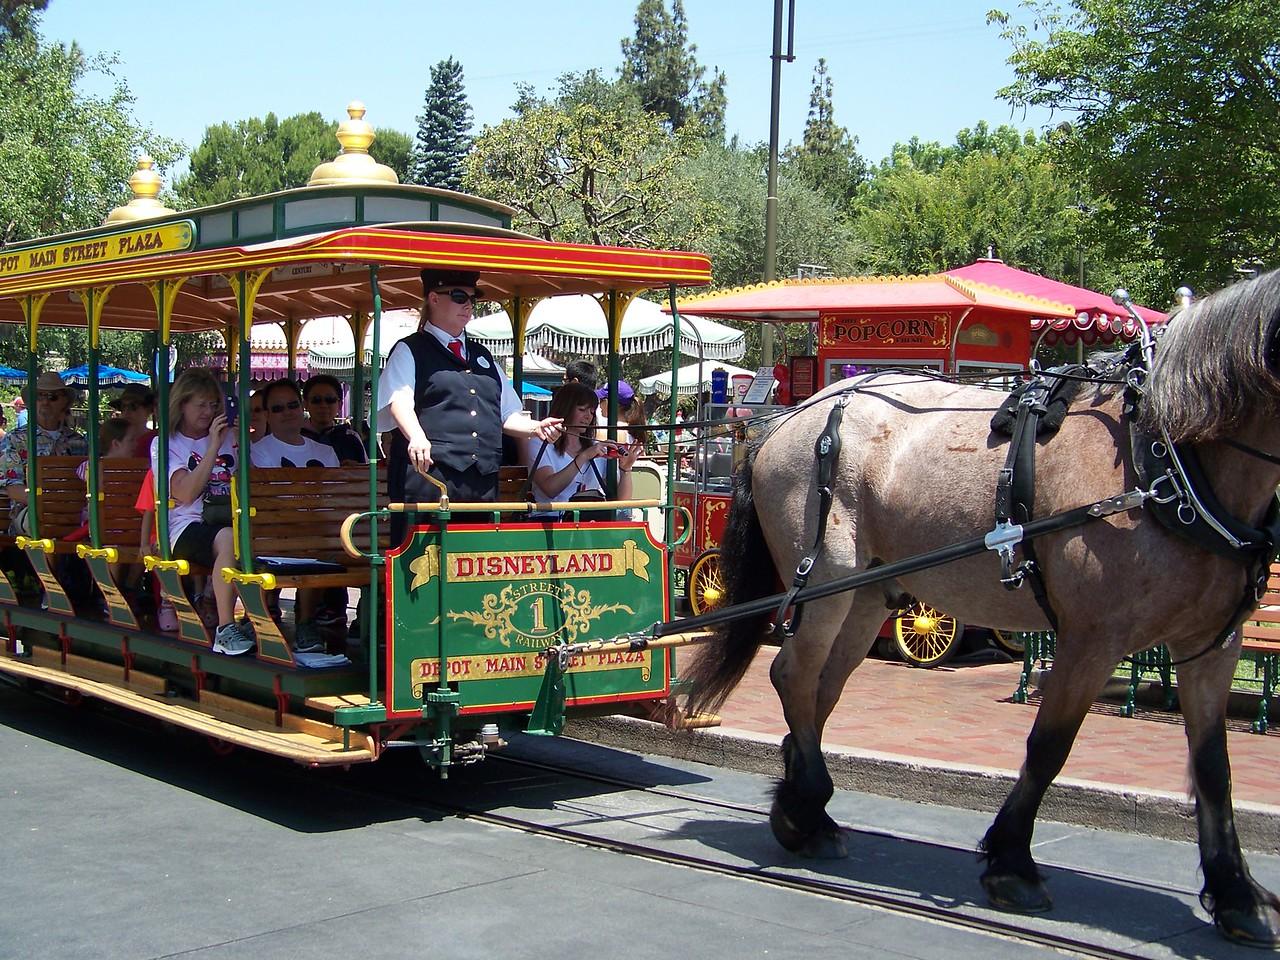 Disneyland - Horse-drawn streetcar